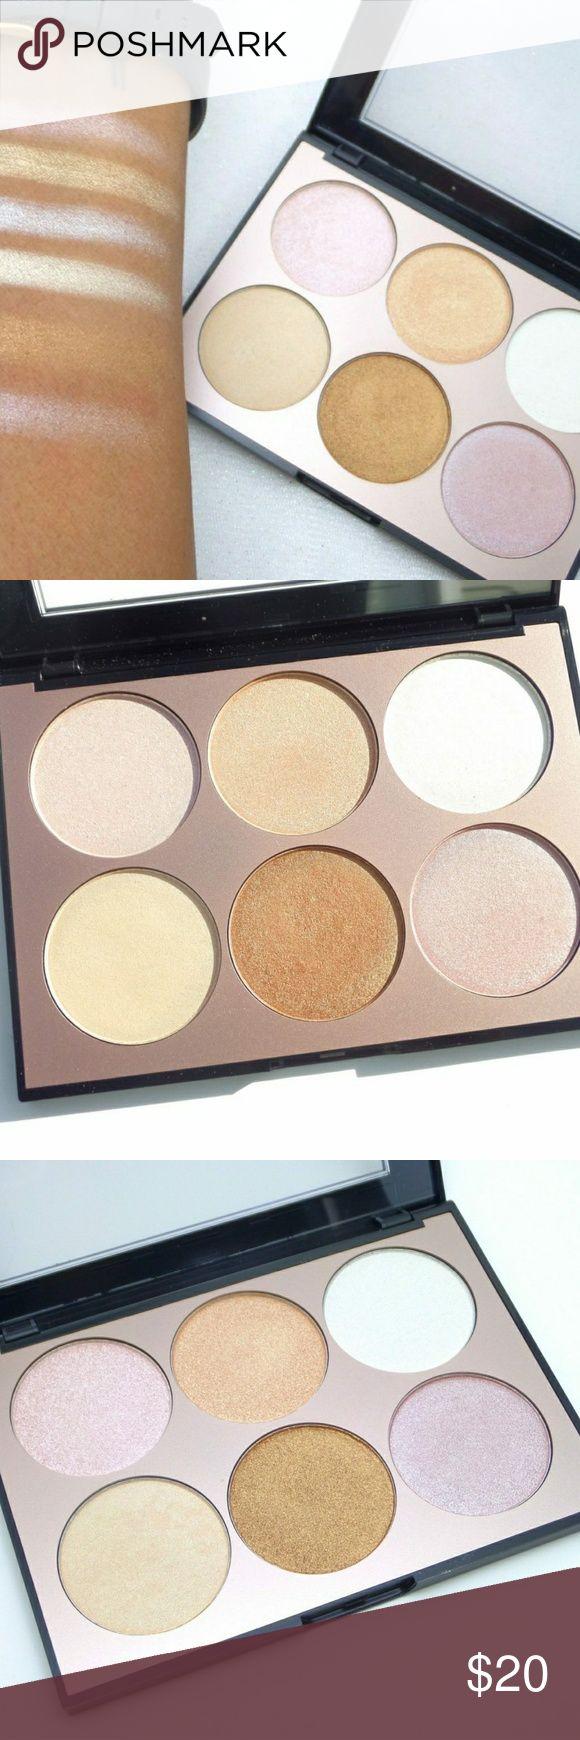 SEPHORA Illuminate Luminizer Palette NWT Sephora makeup